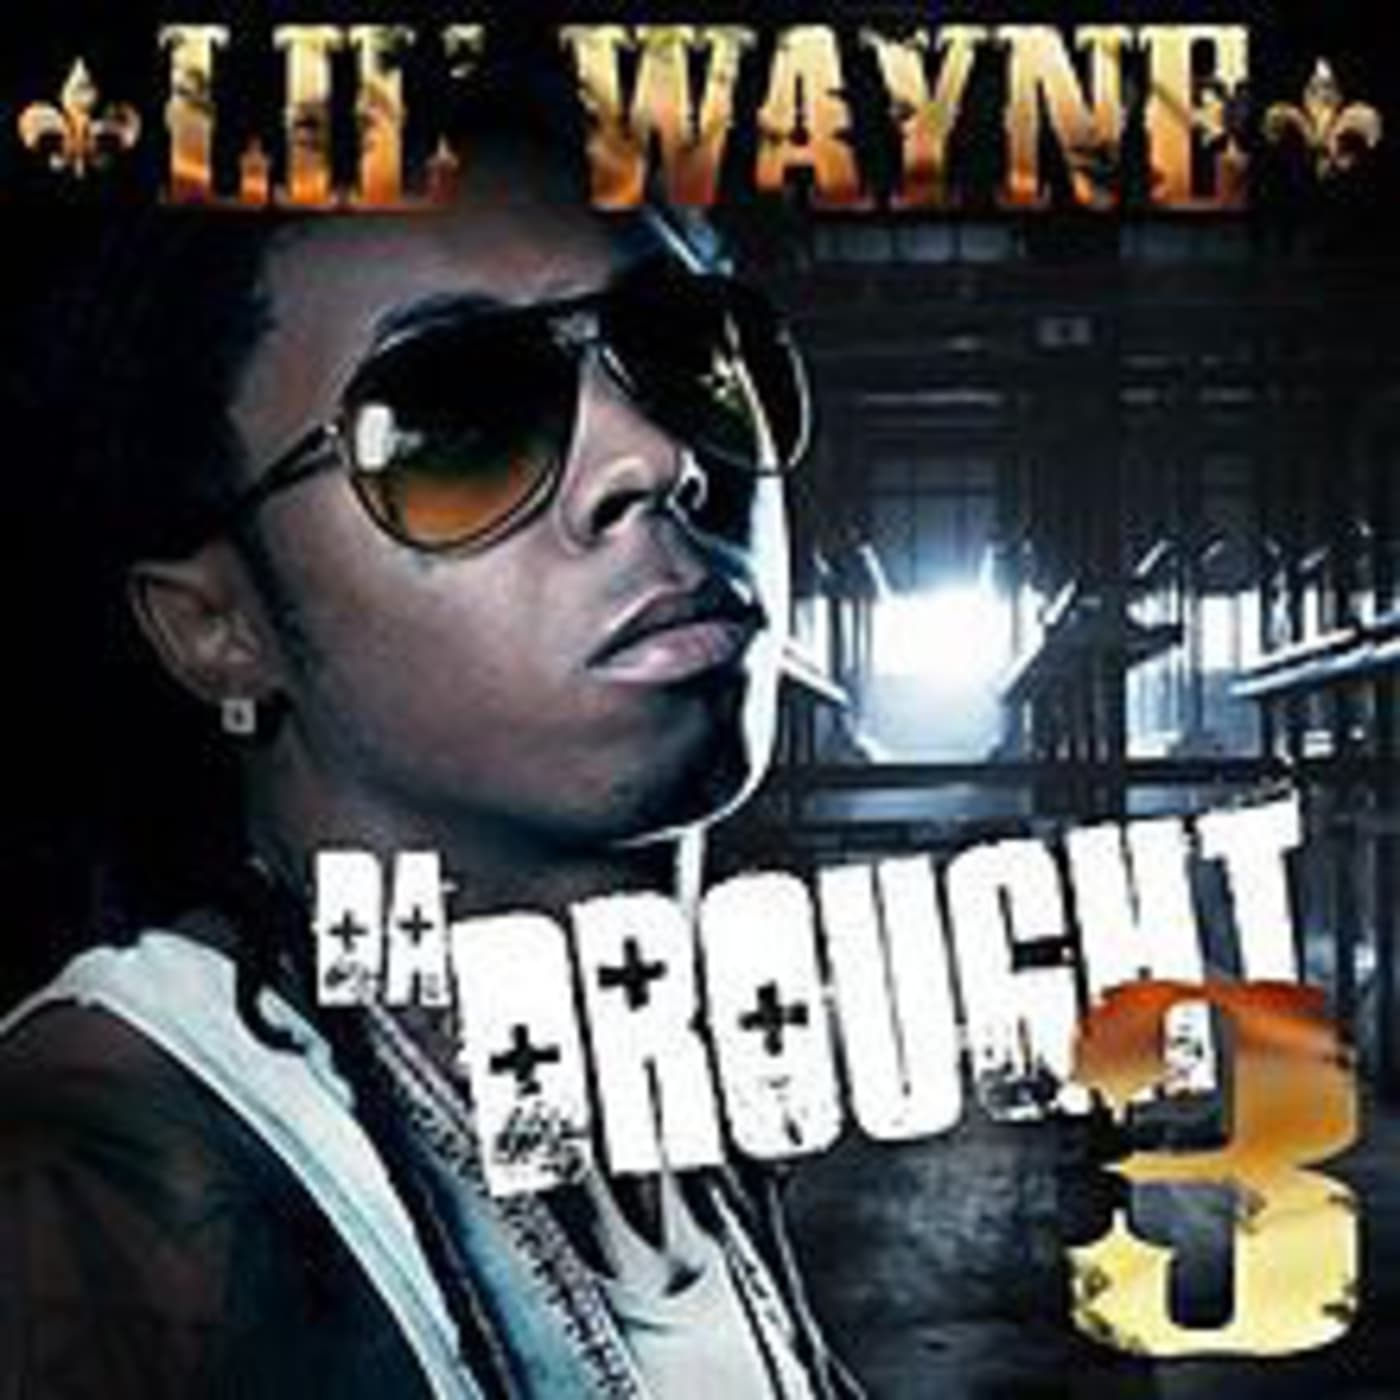 rapper mix tape da drought 3 lil wayne